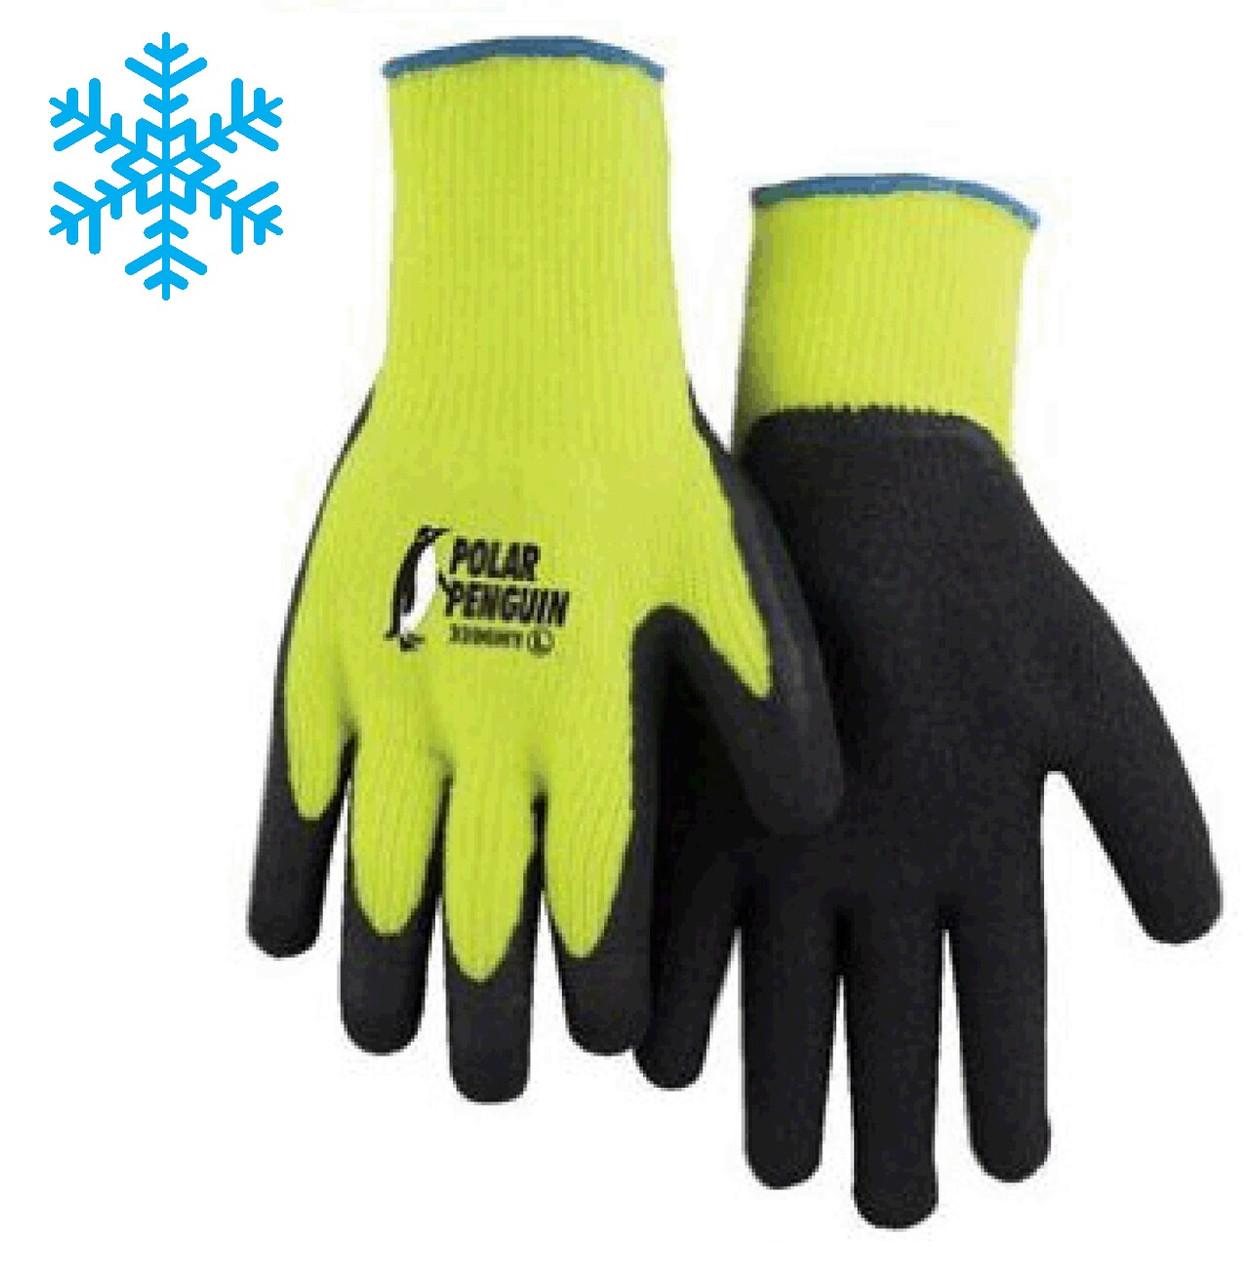 Majestic Glove Polar Penguin 3396HY  Foam Latex Palm Coated, Black/Hi-Vis